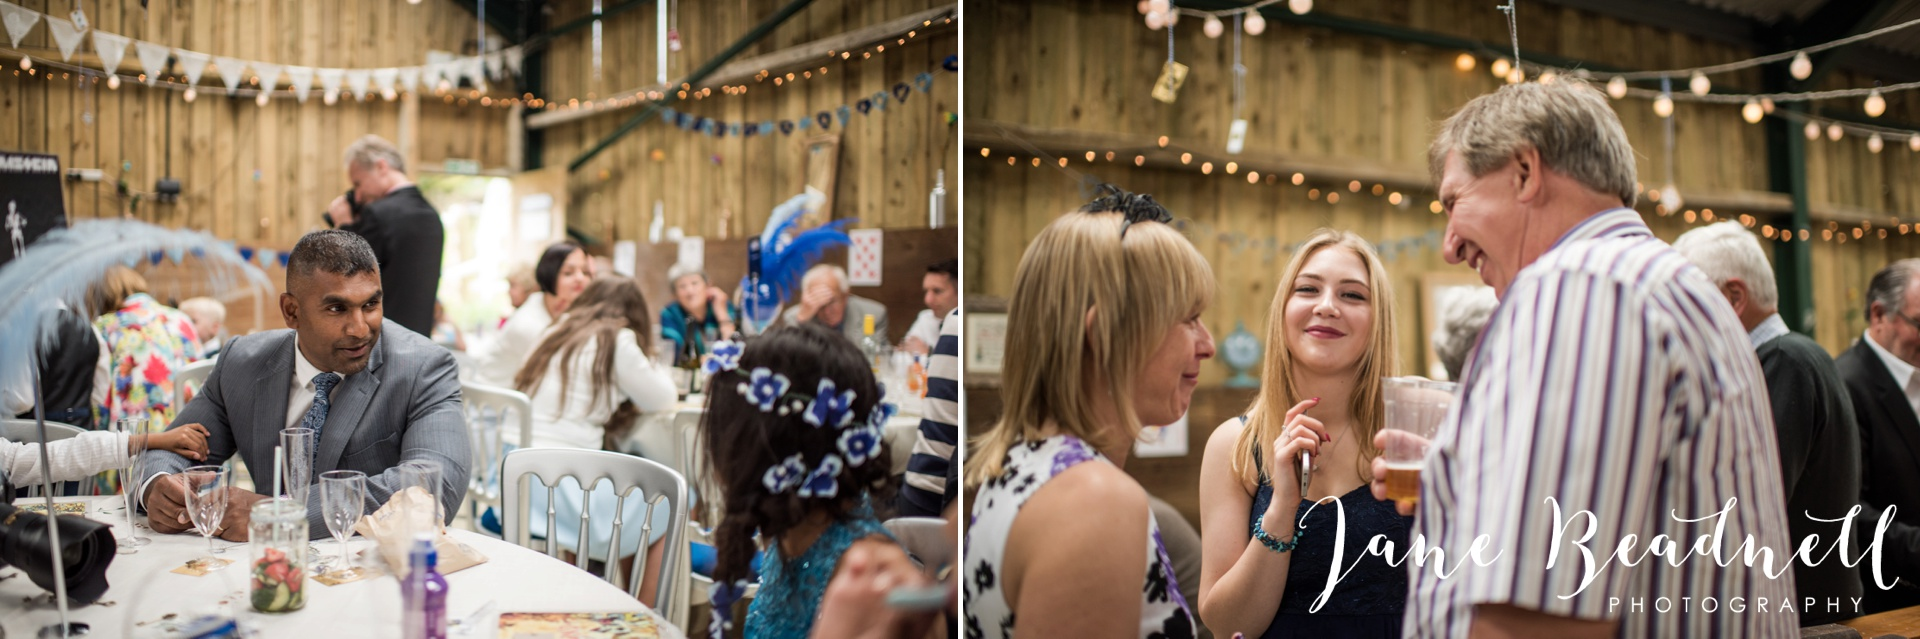 Hill Top Farm Wedding Photography Masham by Jane Beadnell Photography_0085